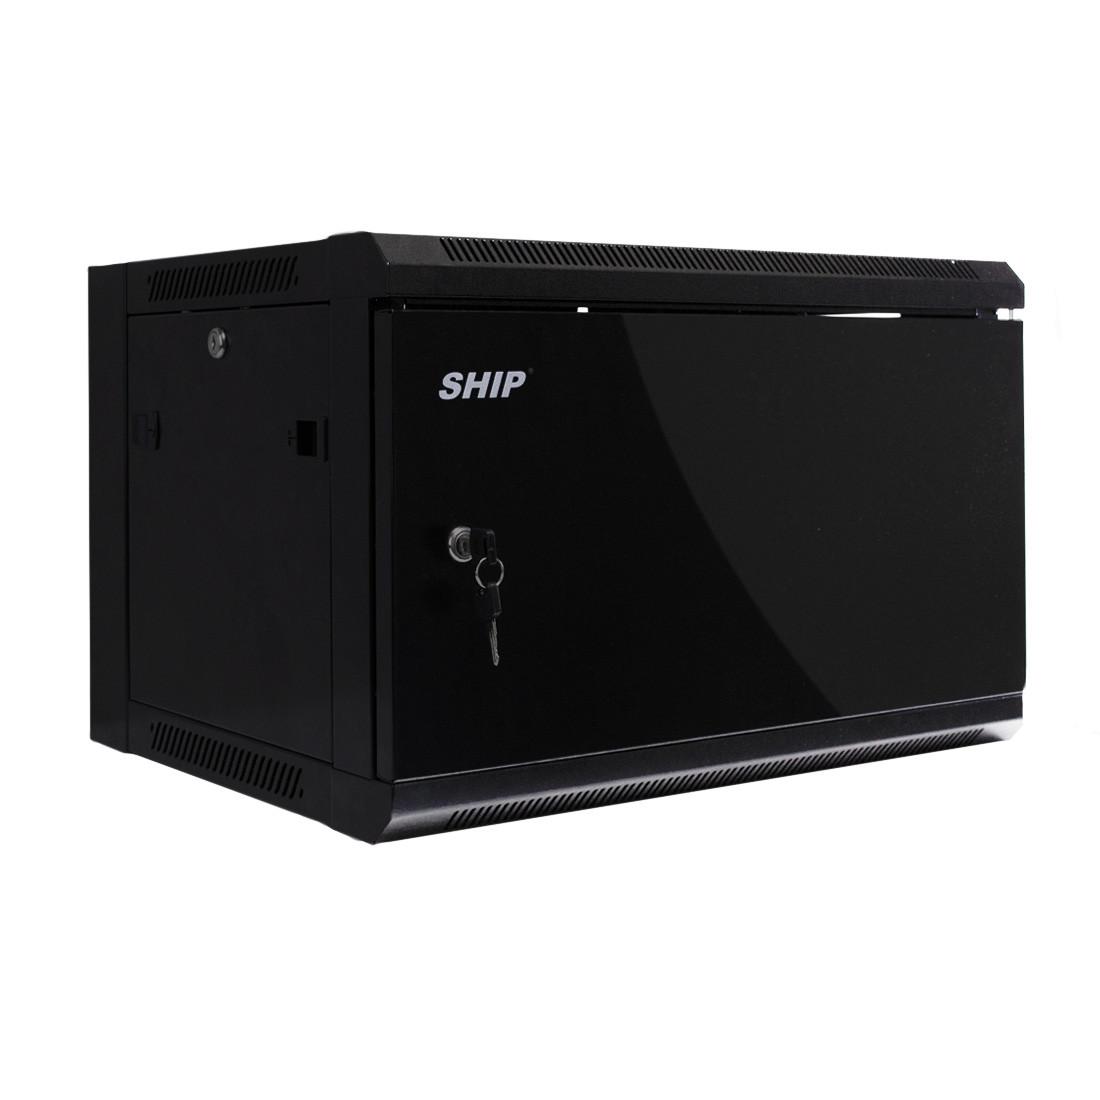 Шкаф настенный SHIP VP5406.100 6U 570*450*380 мм